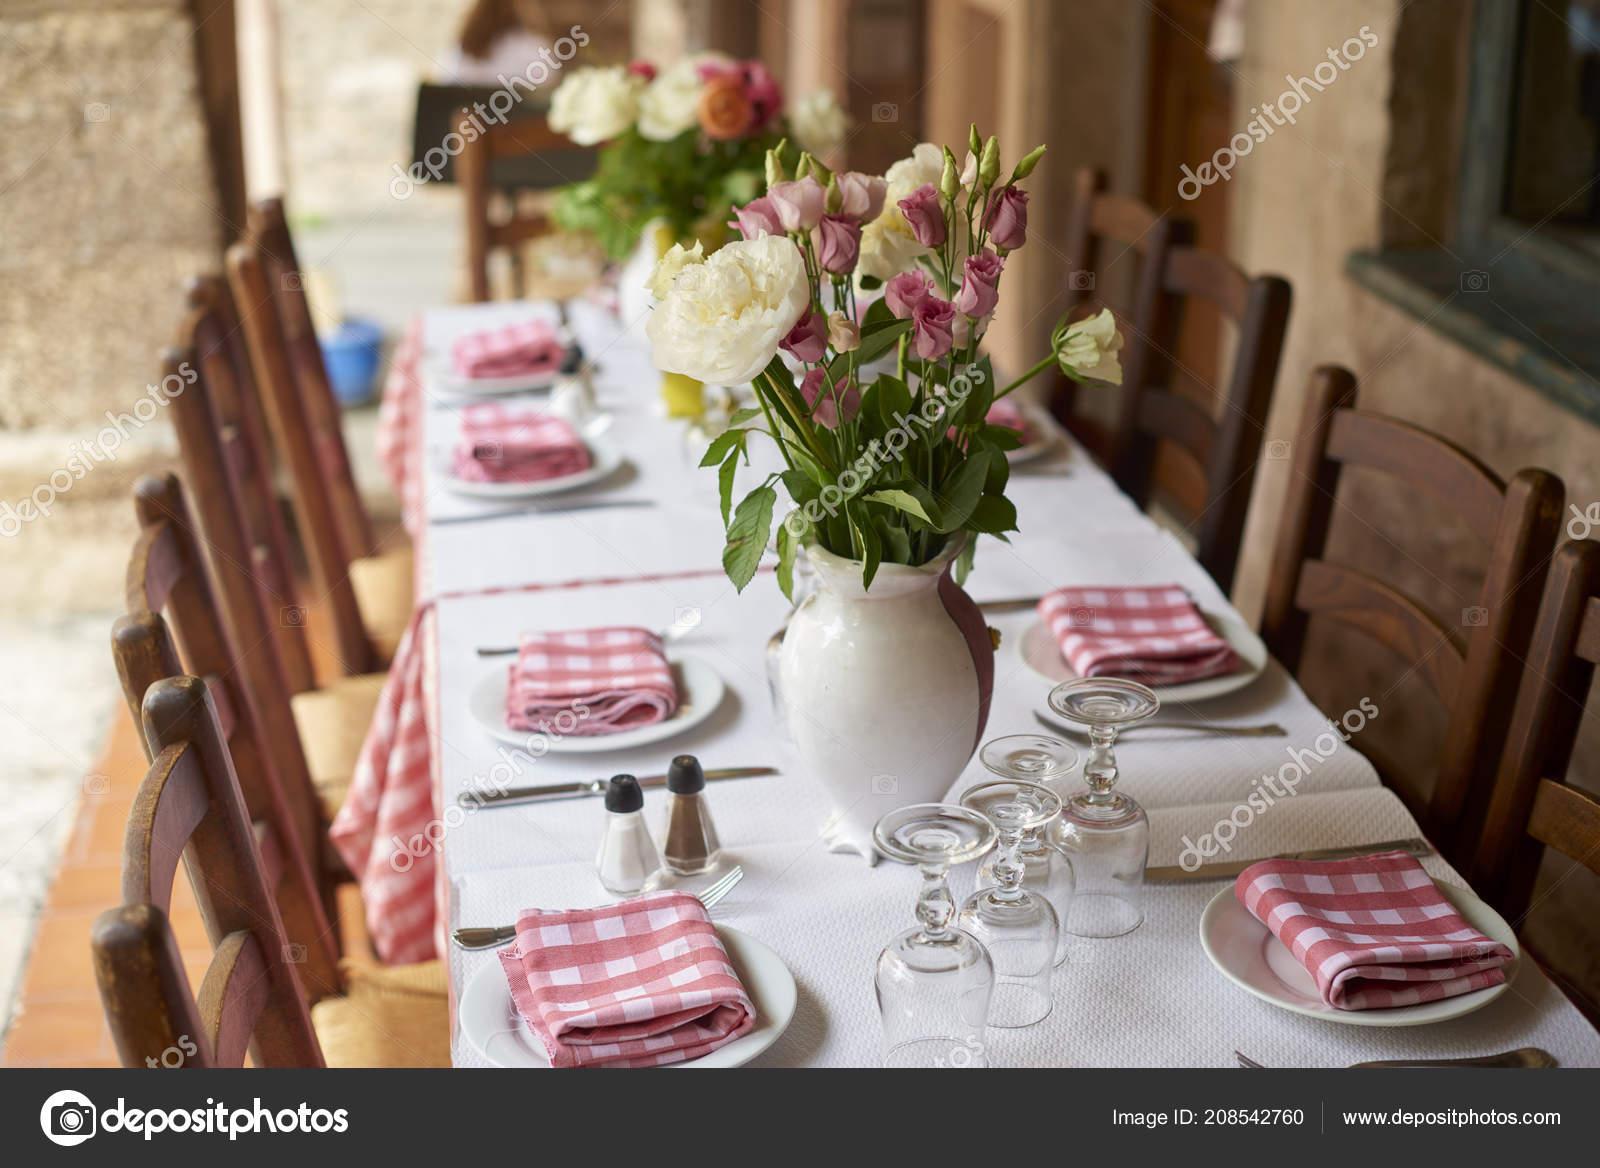 Shot Table Set Meal Restaurant Outdoor Terrace Stock Photo C Gzorgz 208542760